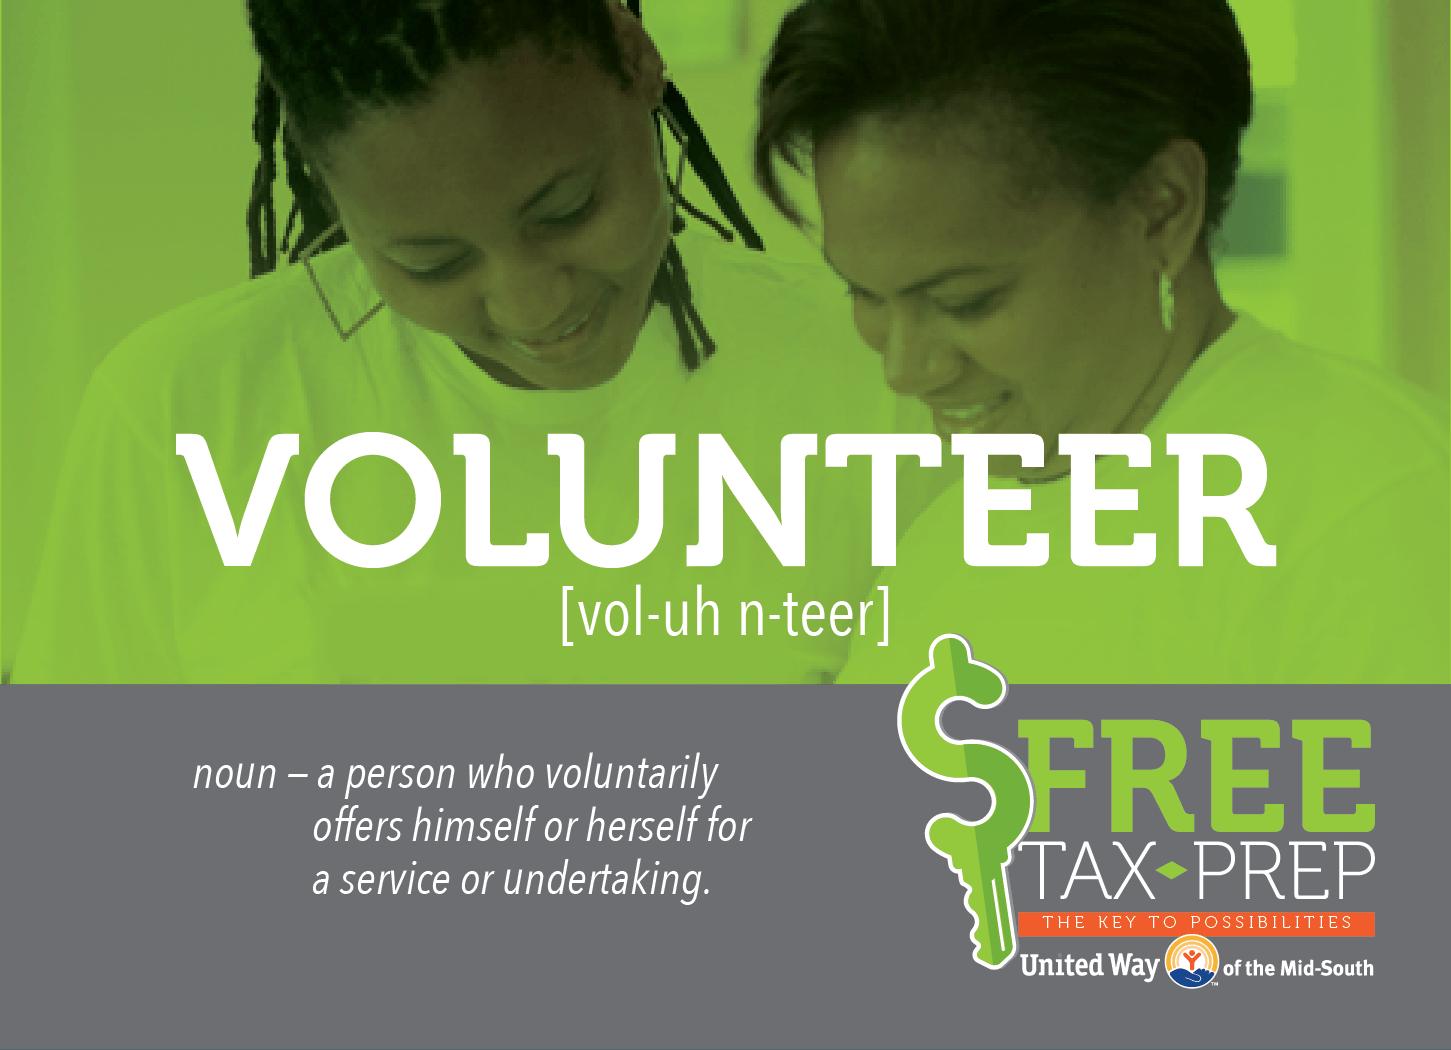 United Way's Free Tax Prep Program; Seeks Volunteers for Launch